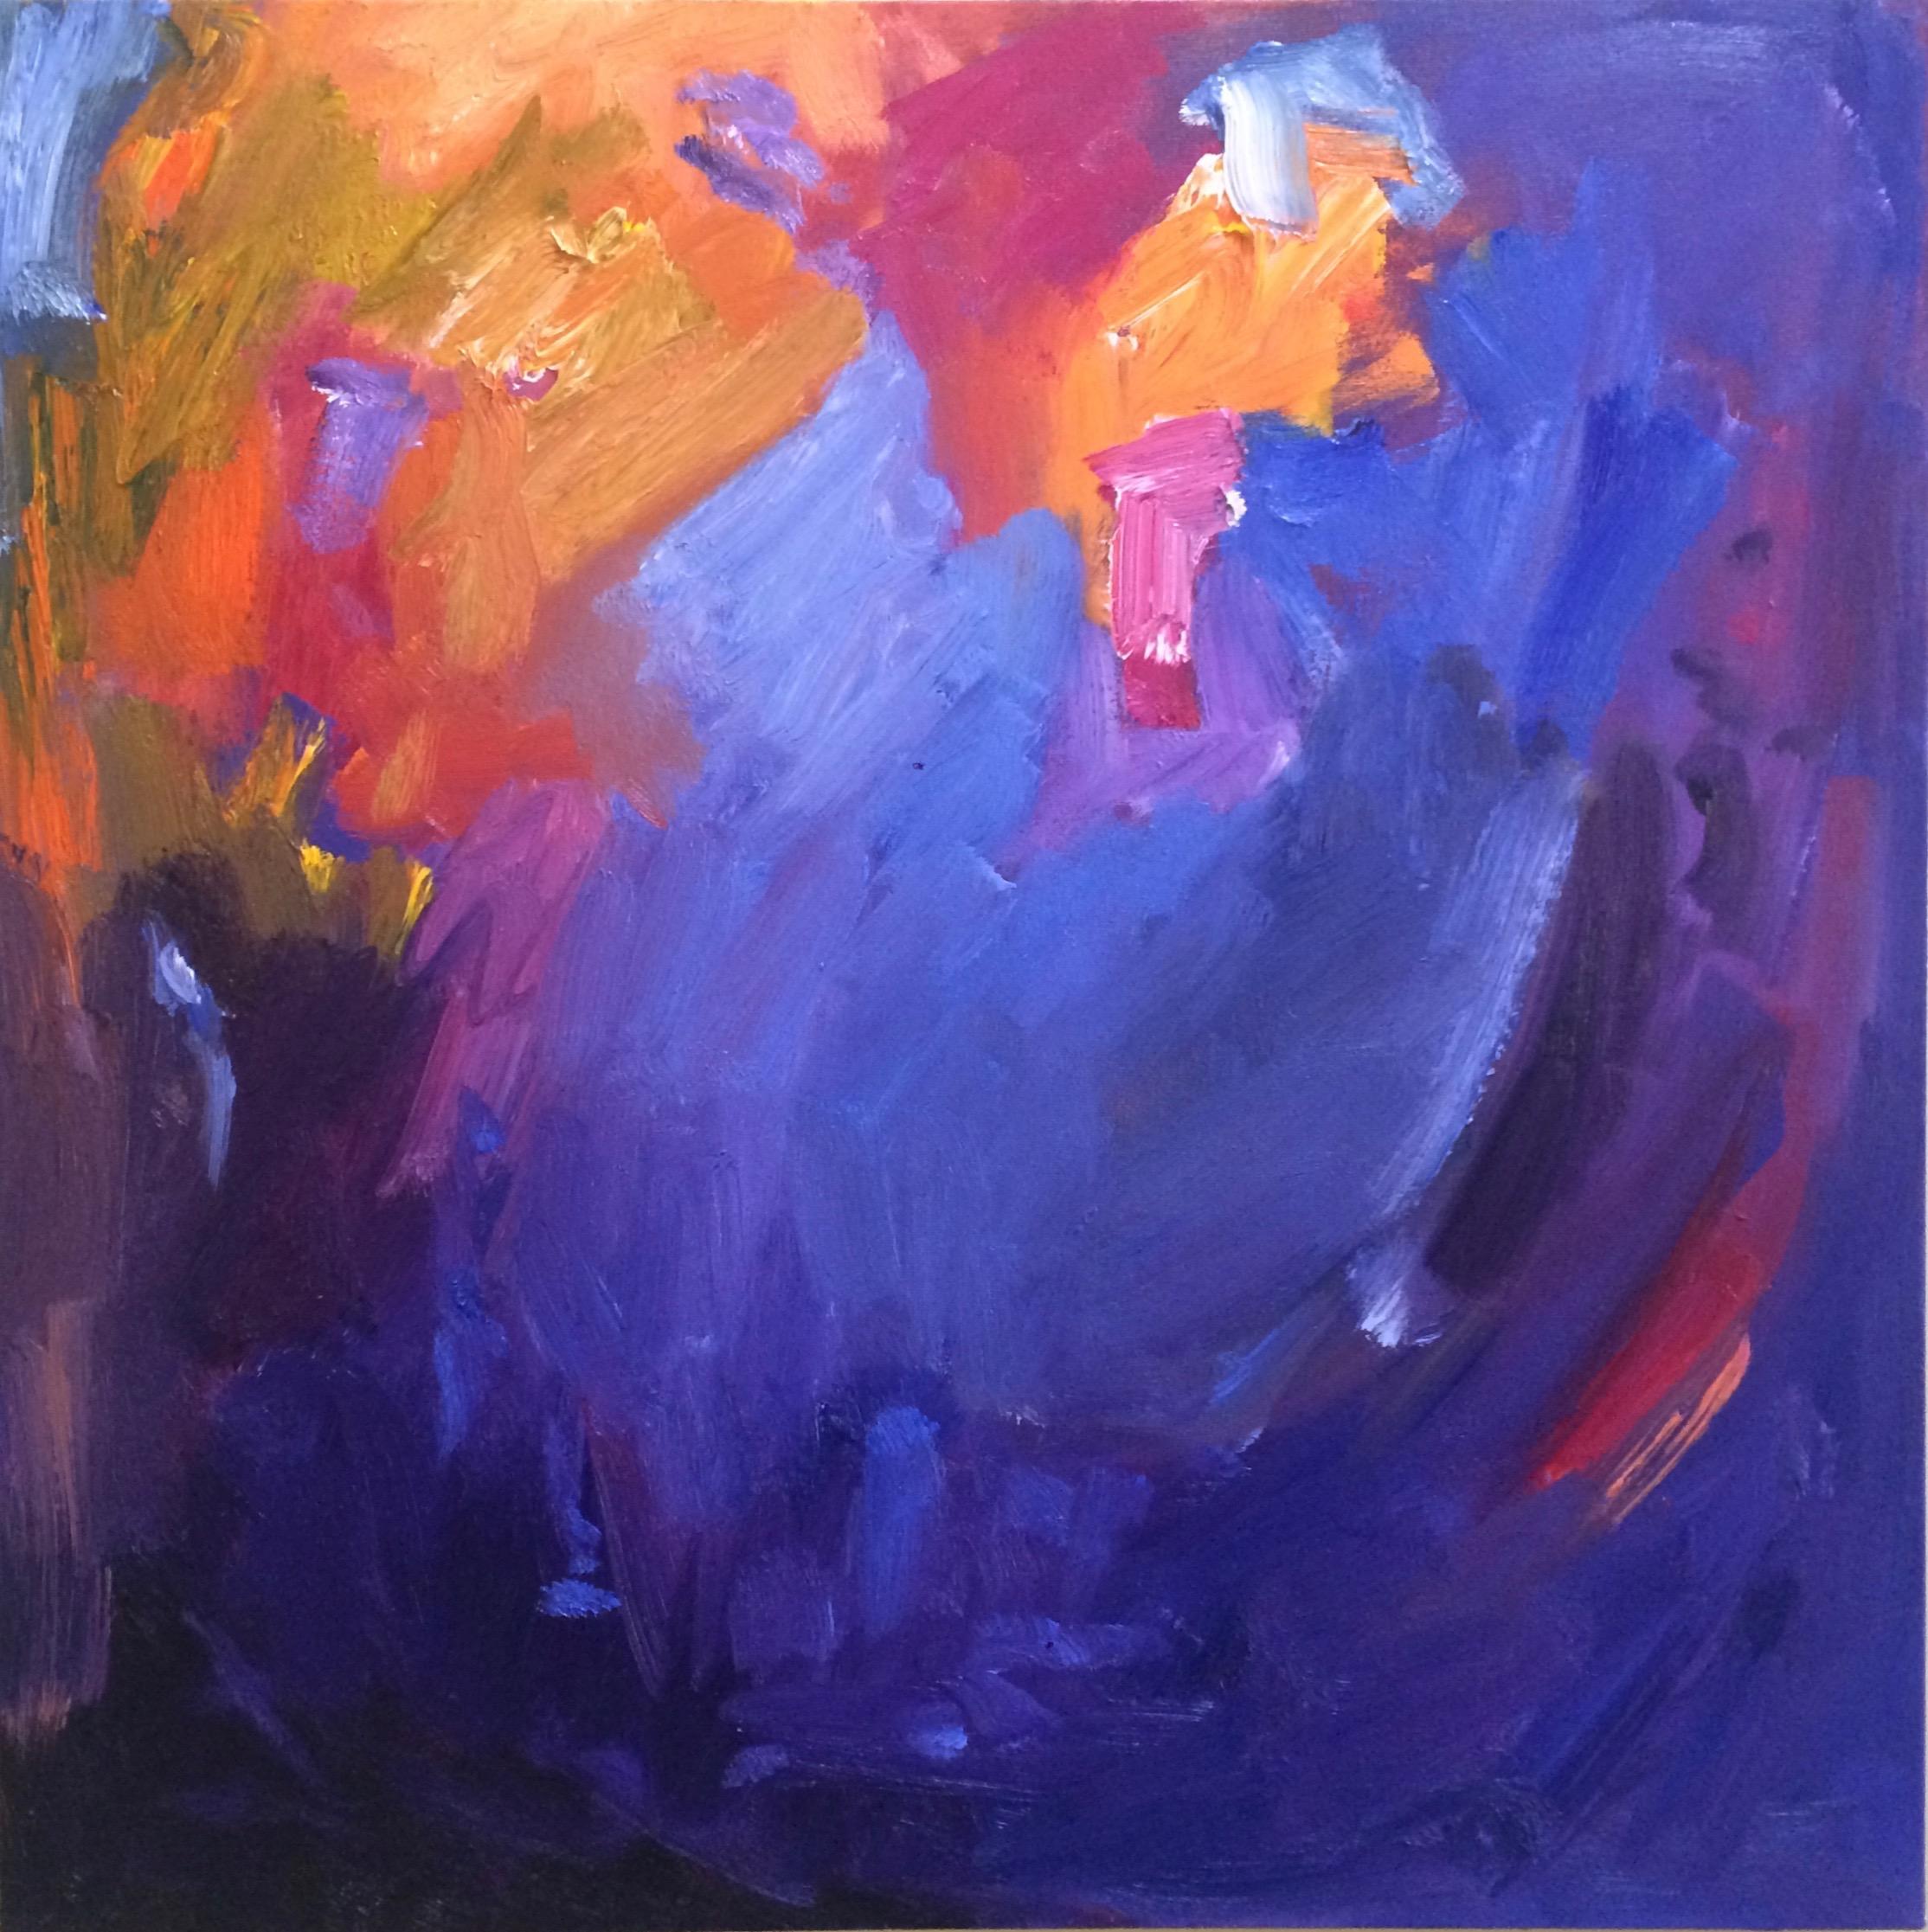 Blue Bay, 24 x 24, Oil on Canvas, $625